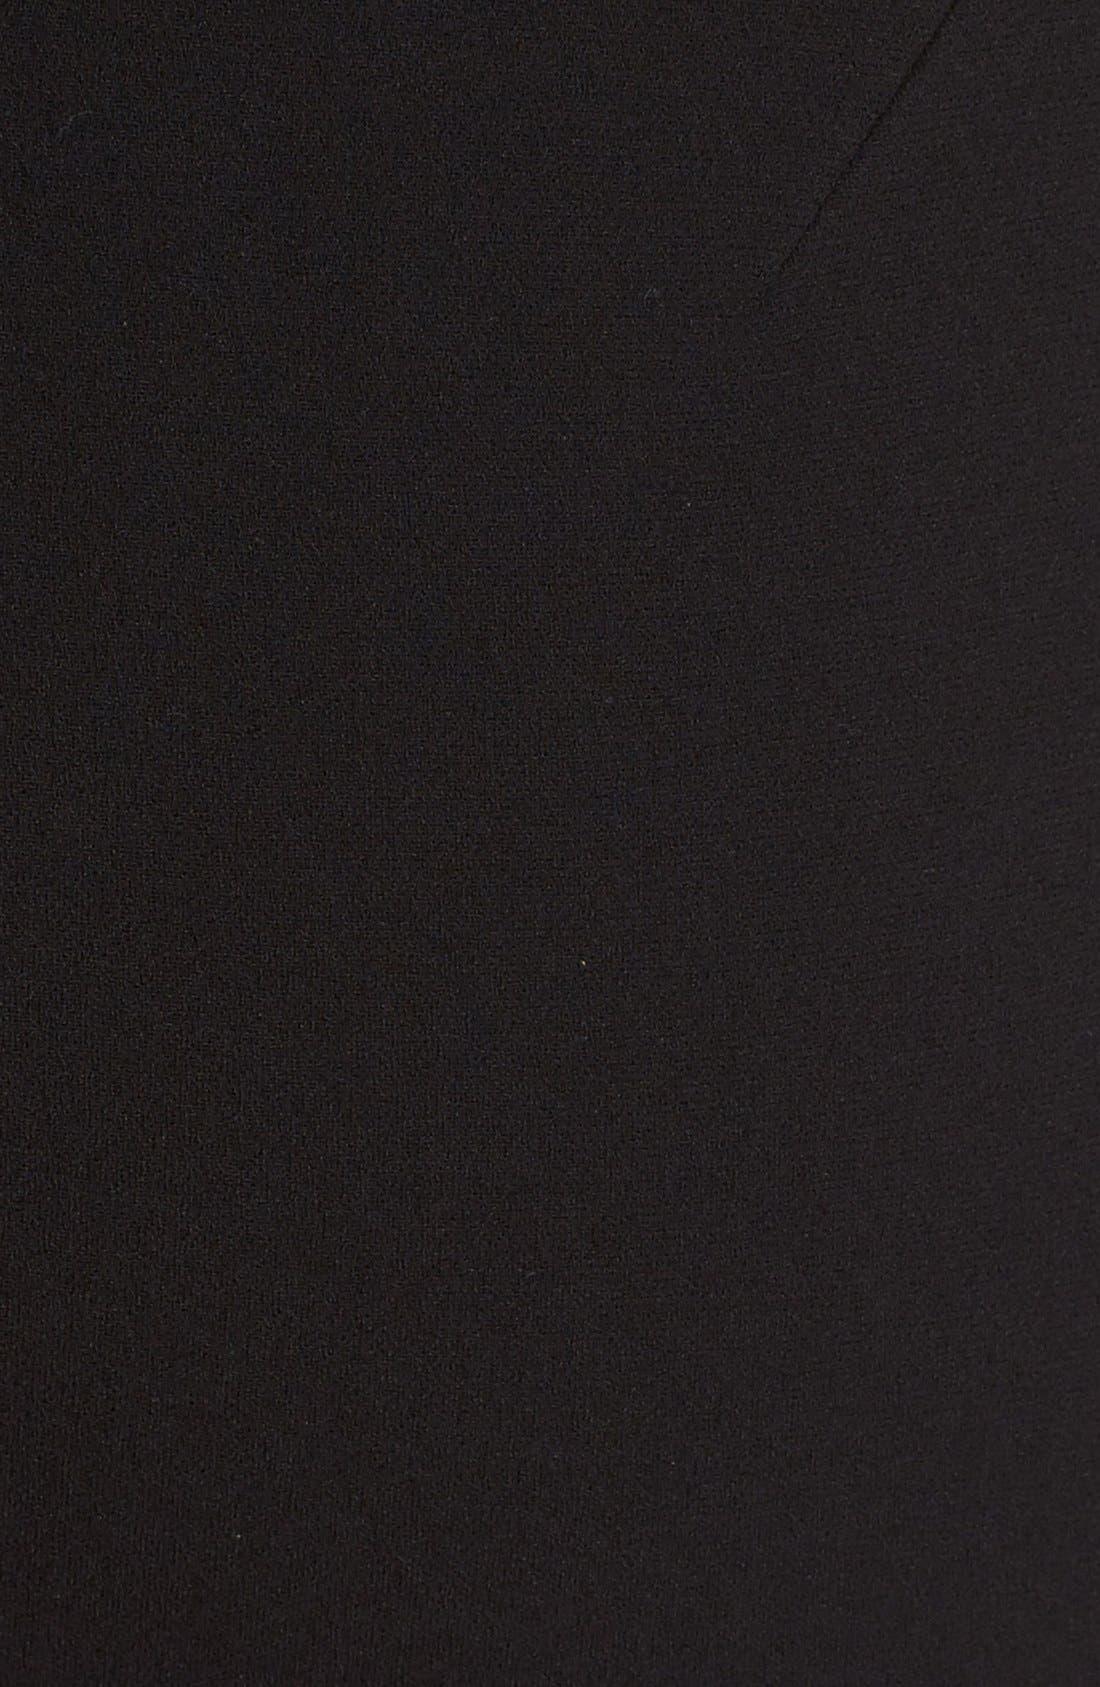 Alternate Image 3  - Victoria Beckham Cross Back Matte Crepe Dress